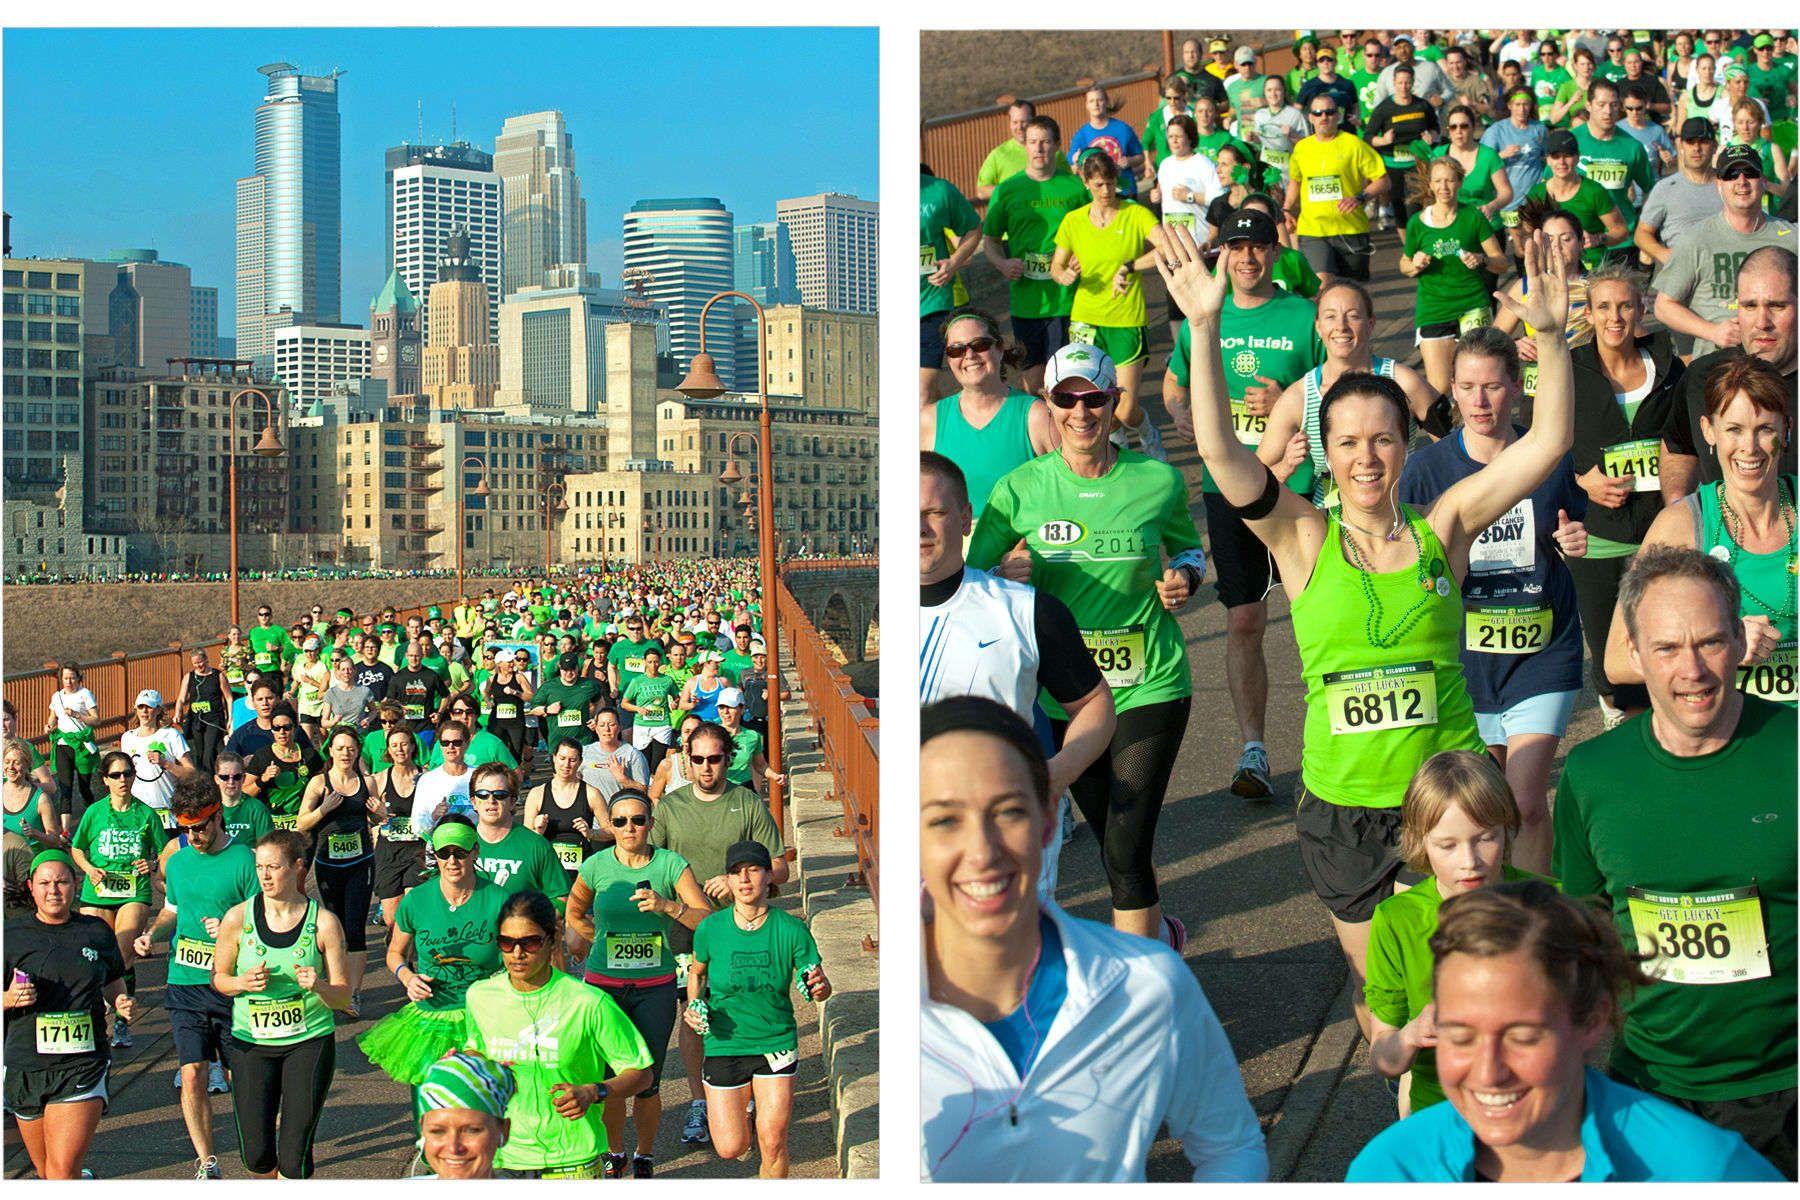 Get Lucky Marathon by Team Ortho